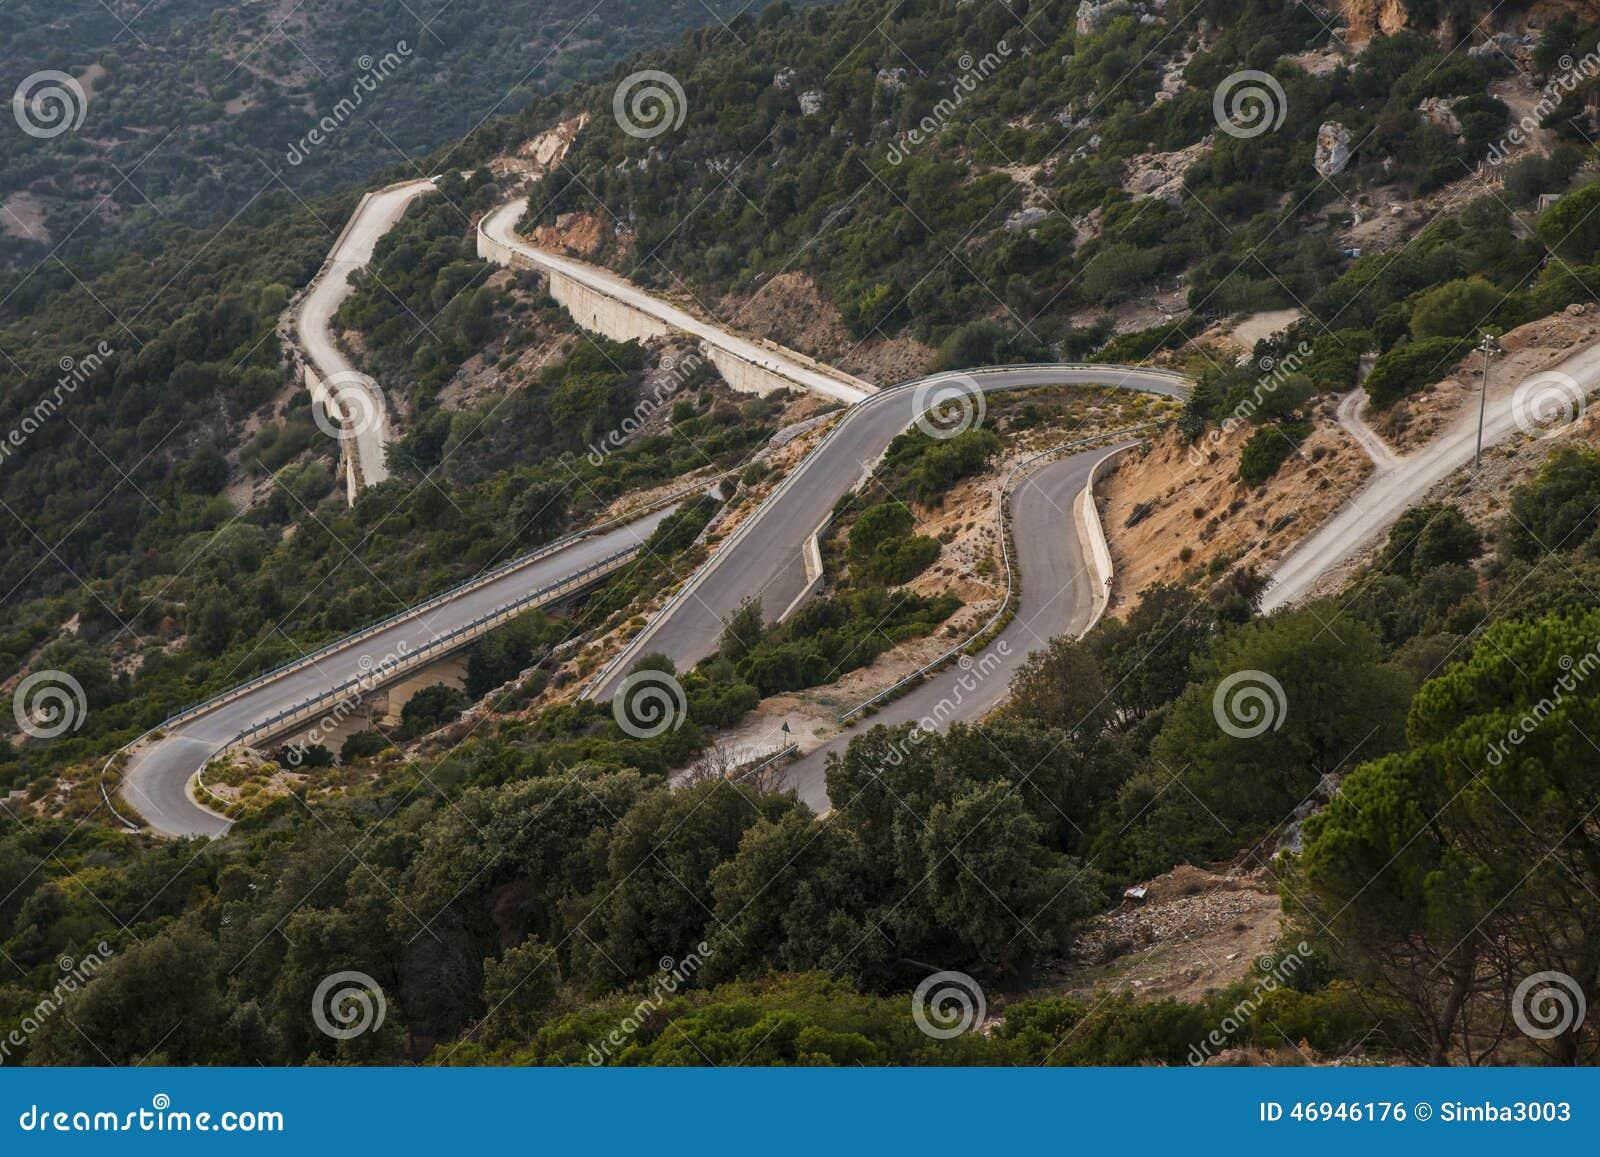 Mountain road on the island of Sardinia